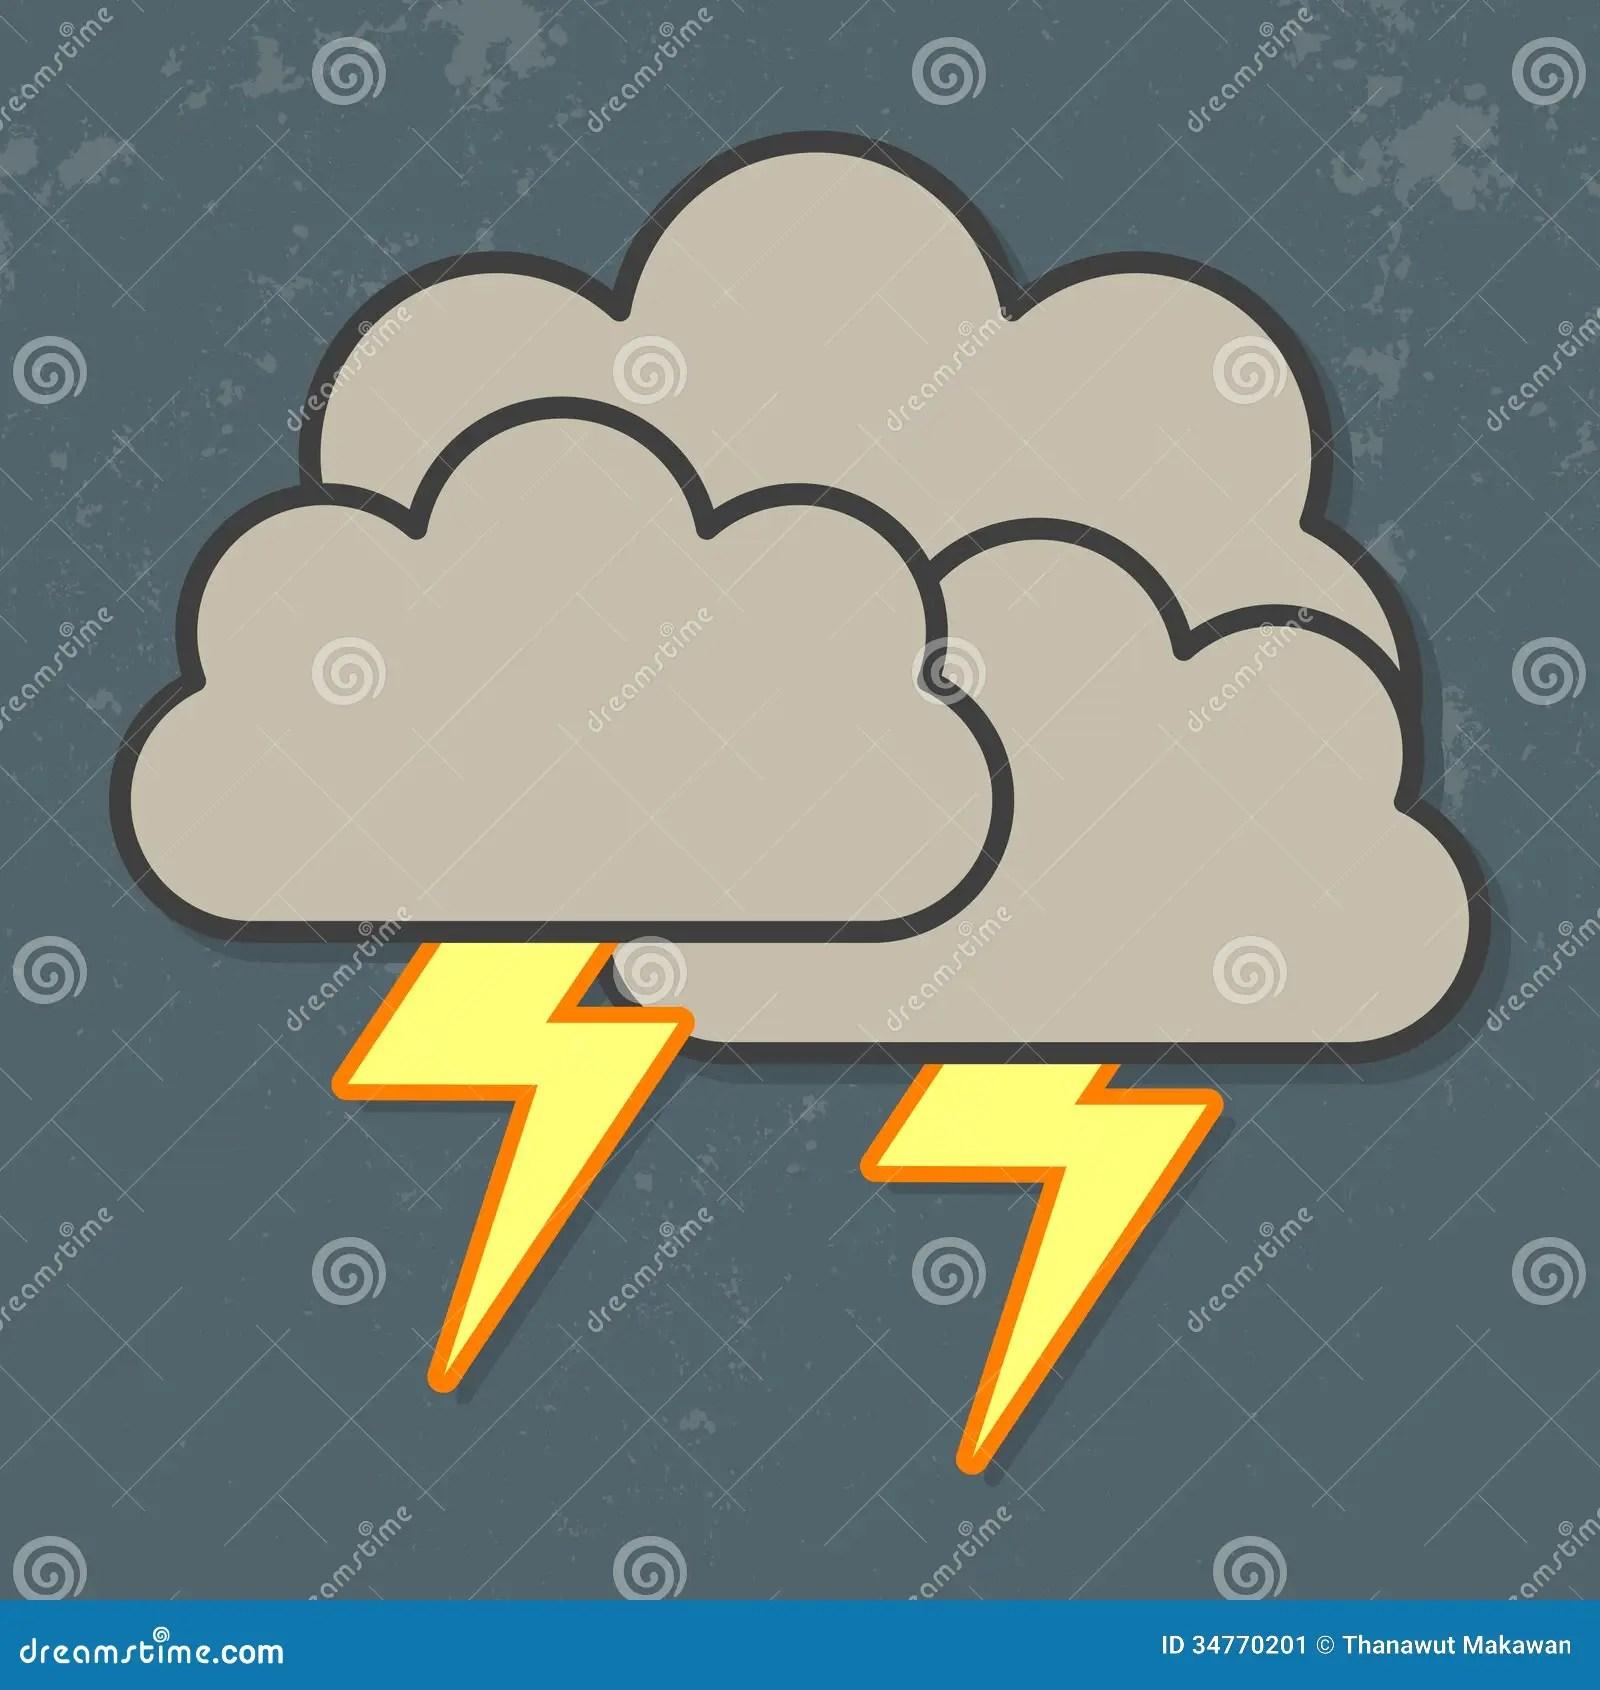 And Lightning Rain Thunder Drawing